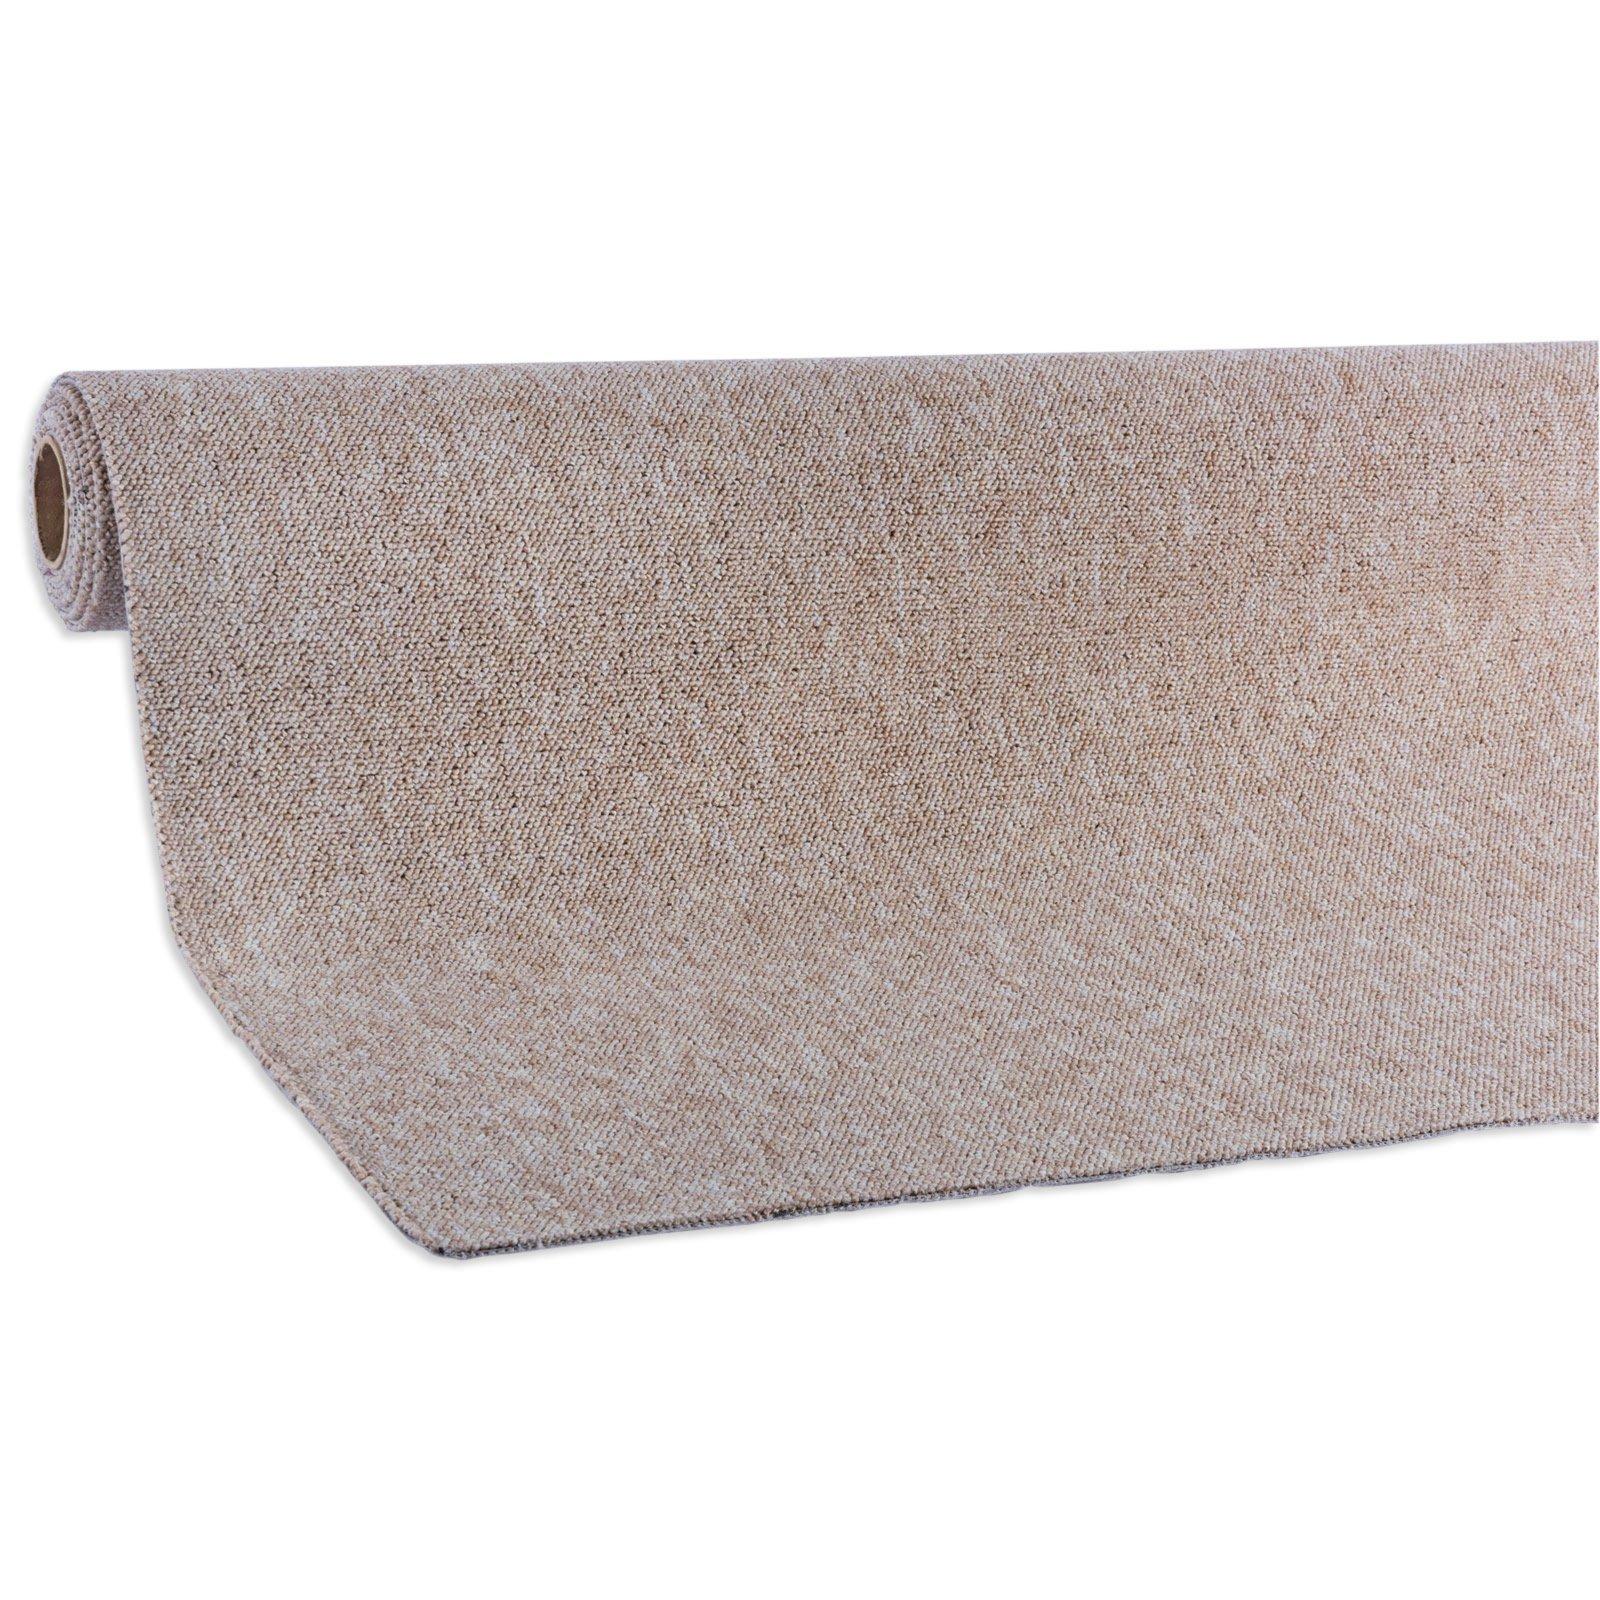 teppichboden torgau beige 5 meter breit teppichboden bodenbel ge baumarkt roller. Black Bedroom Furniture Sets. Home Design Ideas